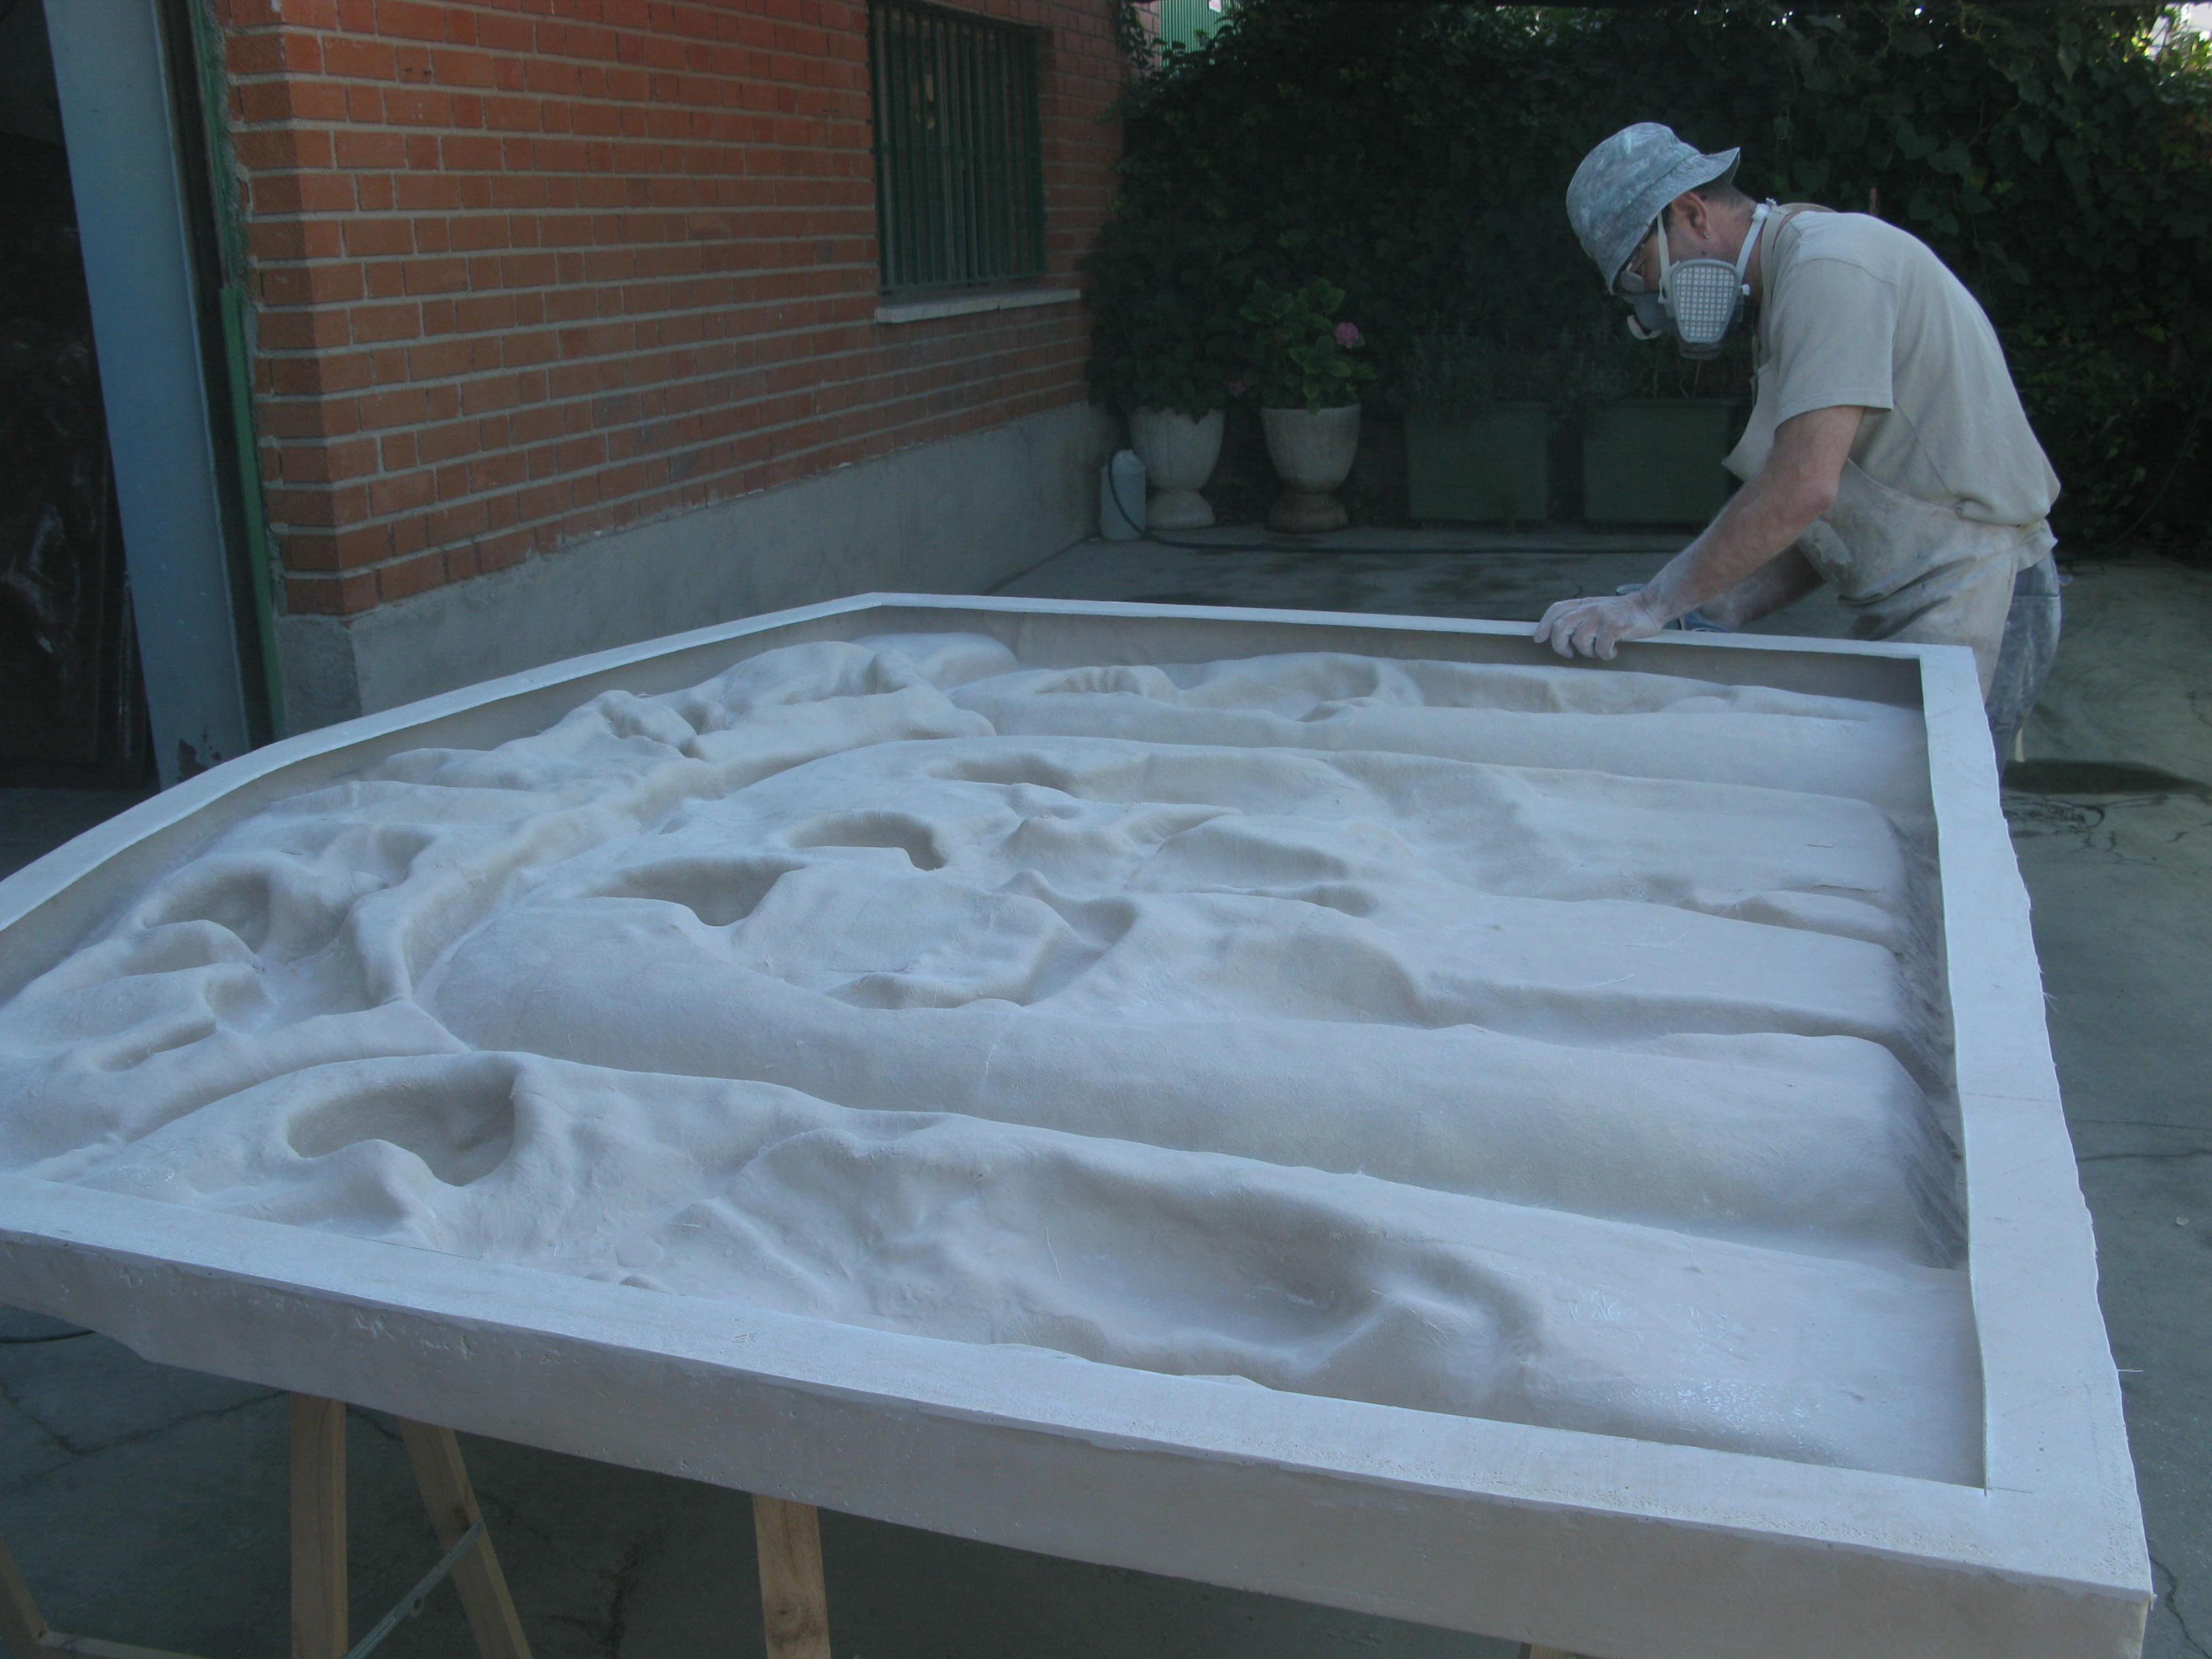 esculturas y moldes numa obra monumental